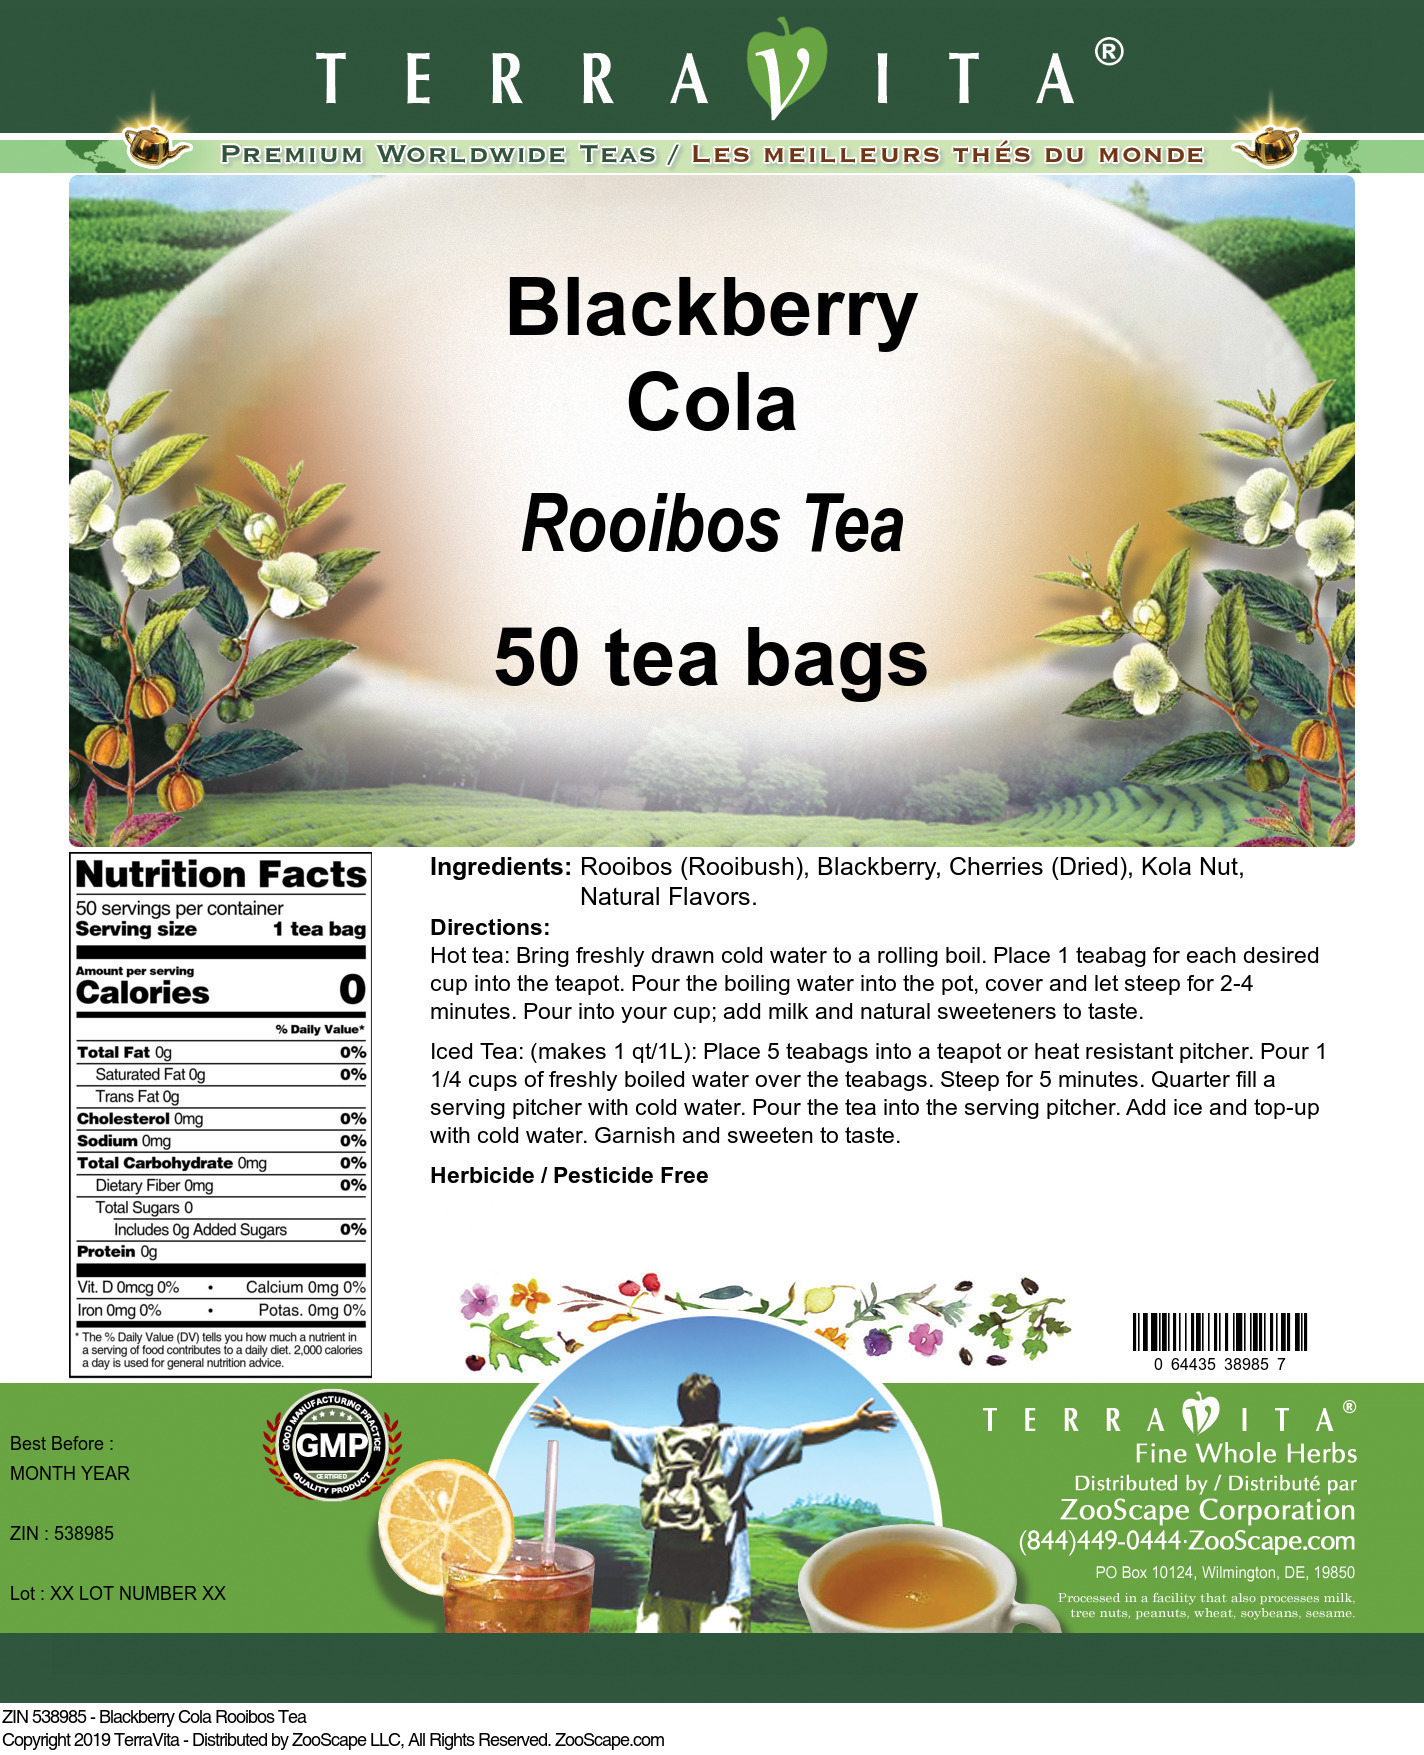 Blackberry Cola Rooibos Tea